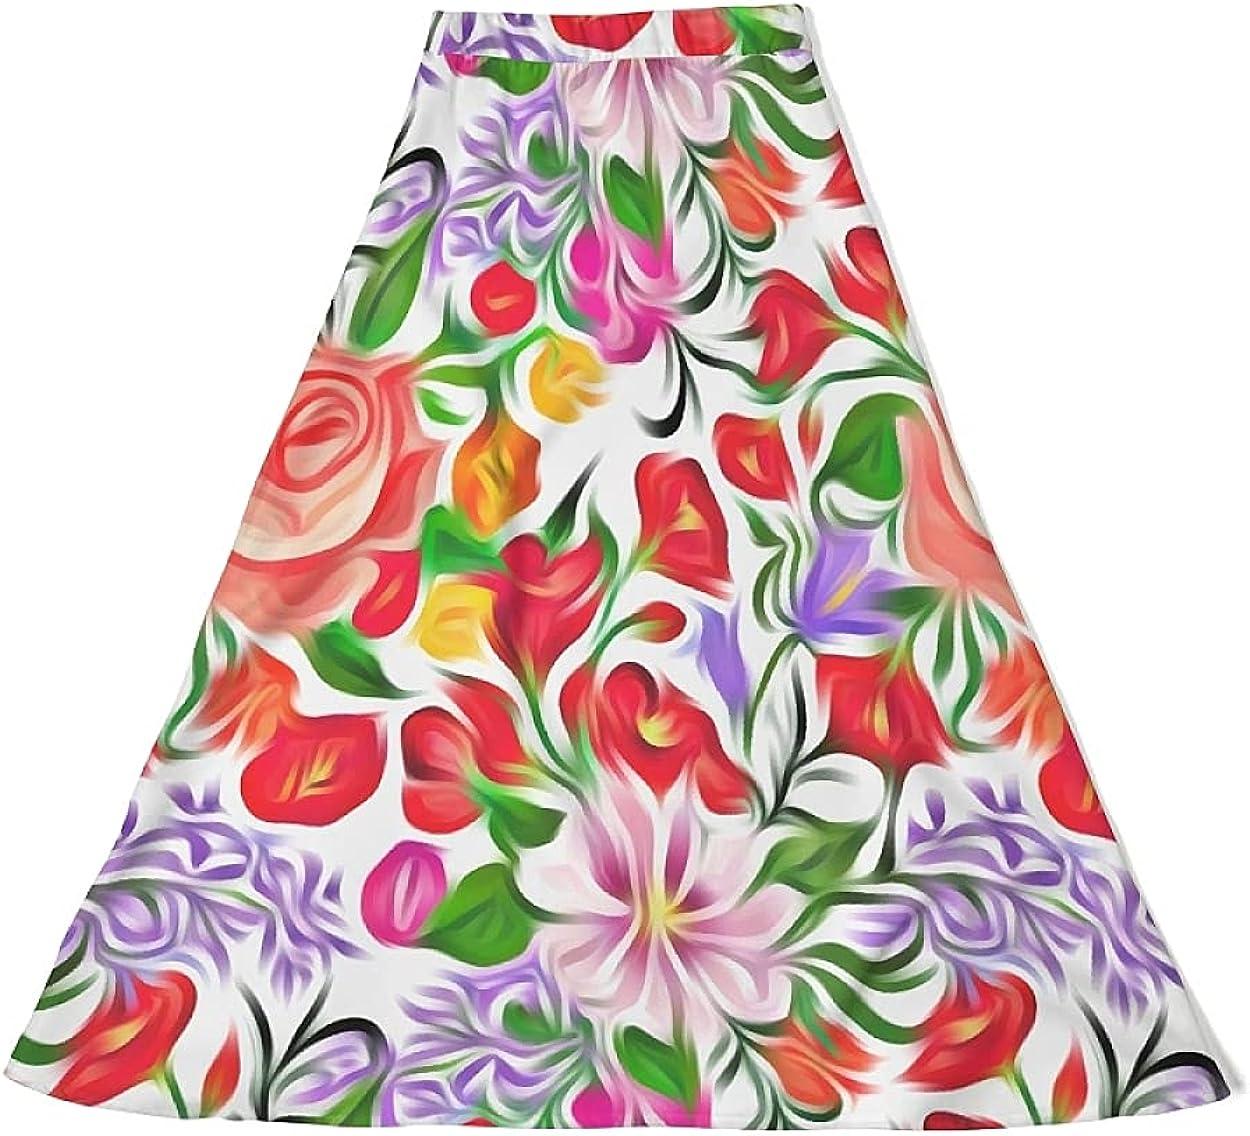 Women's A-Line Skirt Classic Casual Stretch High Waist Middle Length Chiffon Skirt